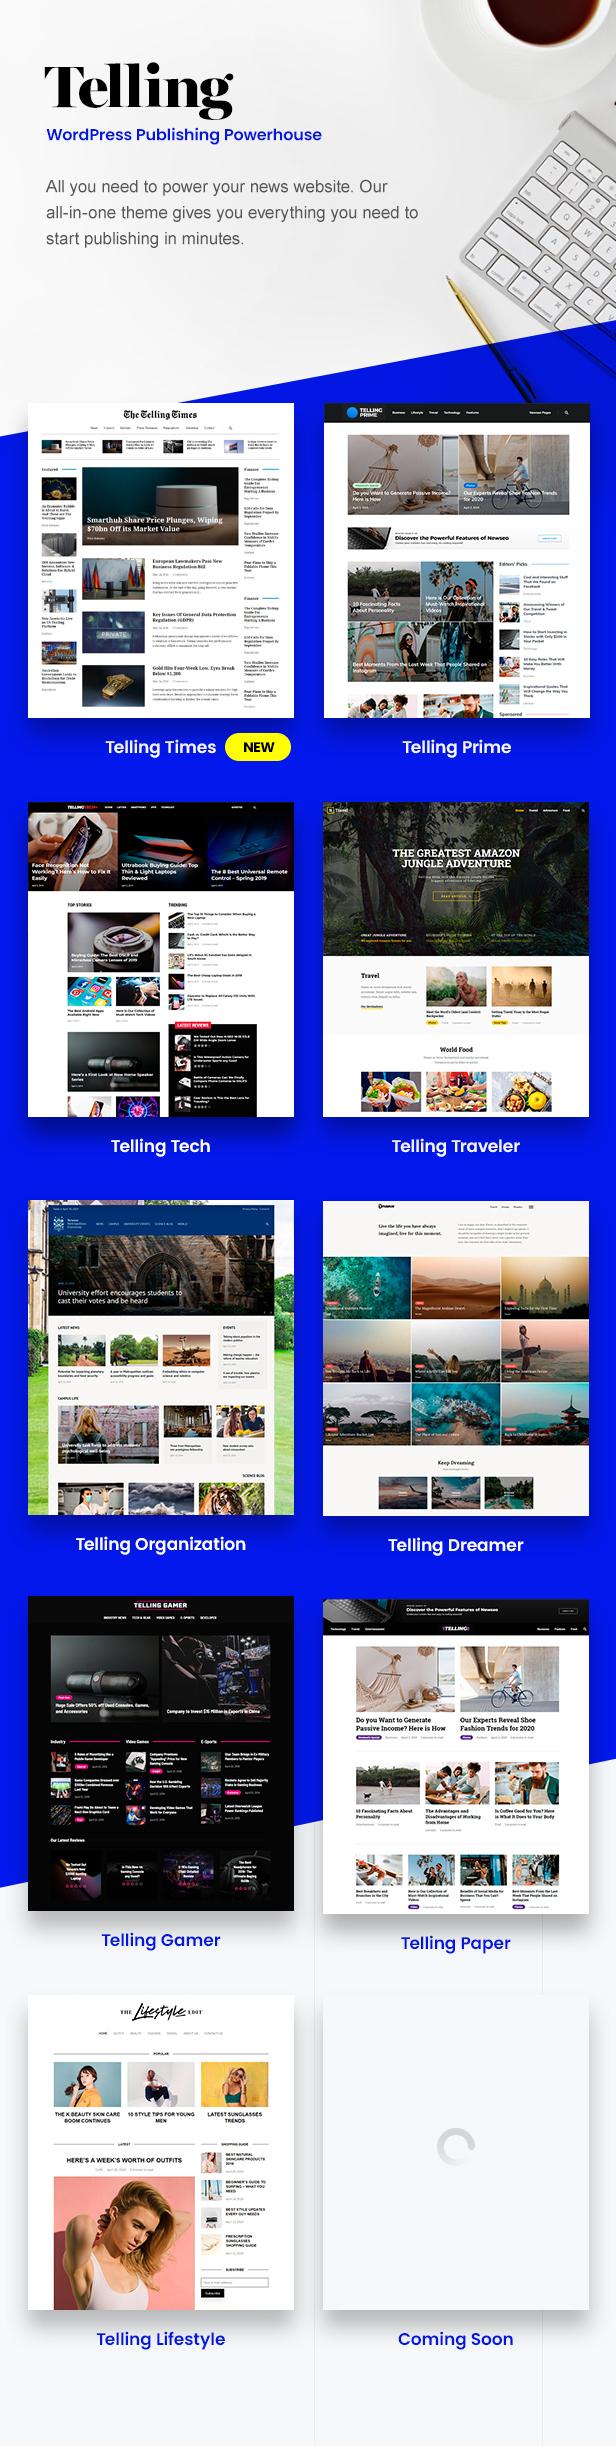 Telling - Multi-Concept News und Publishing Theme - 1